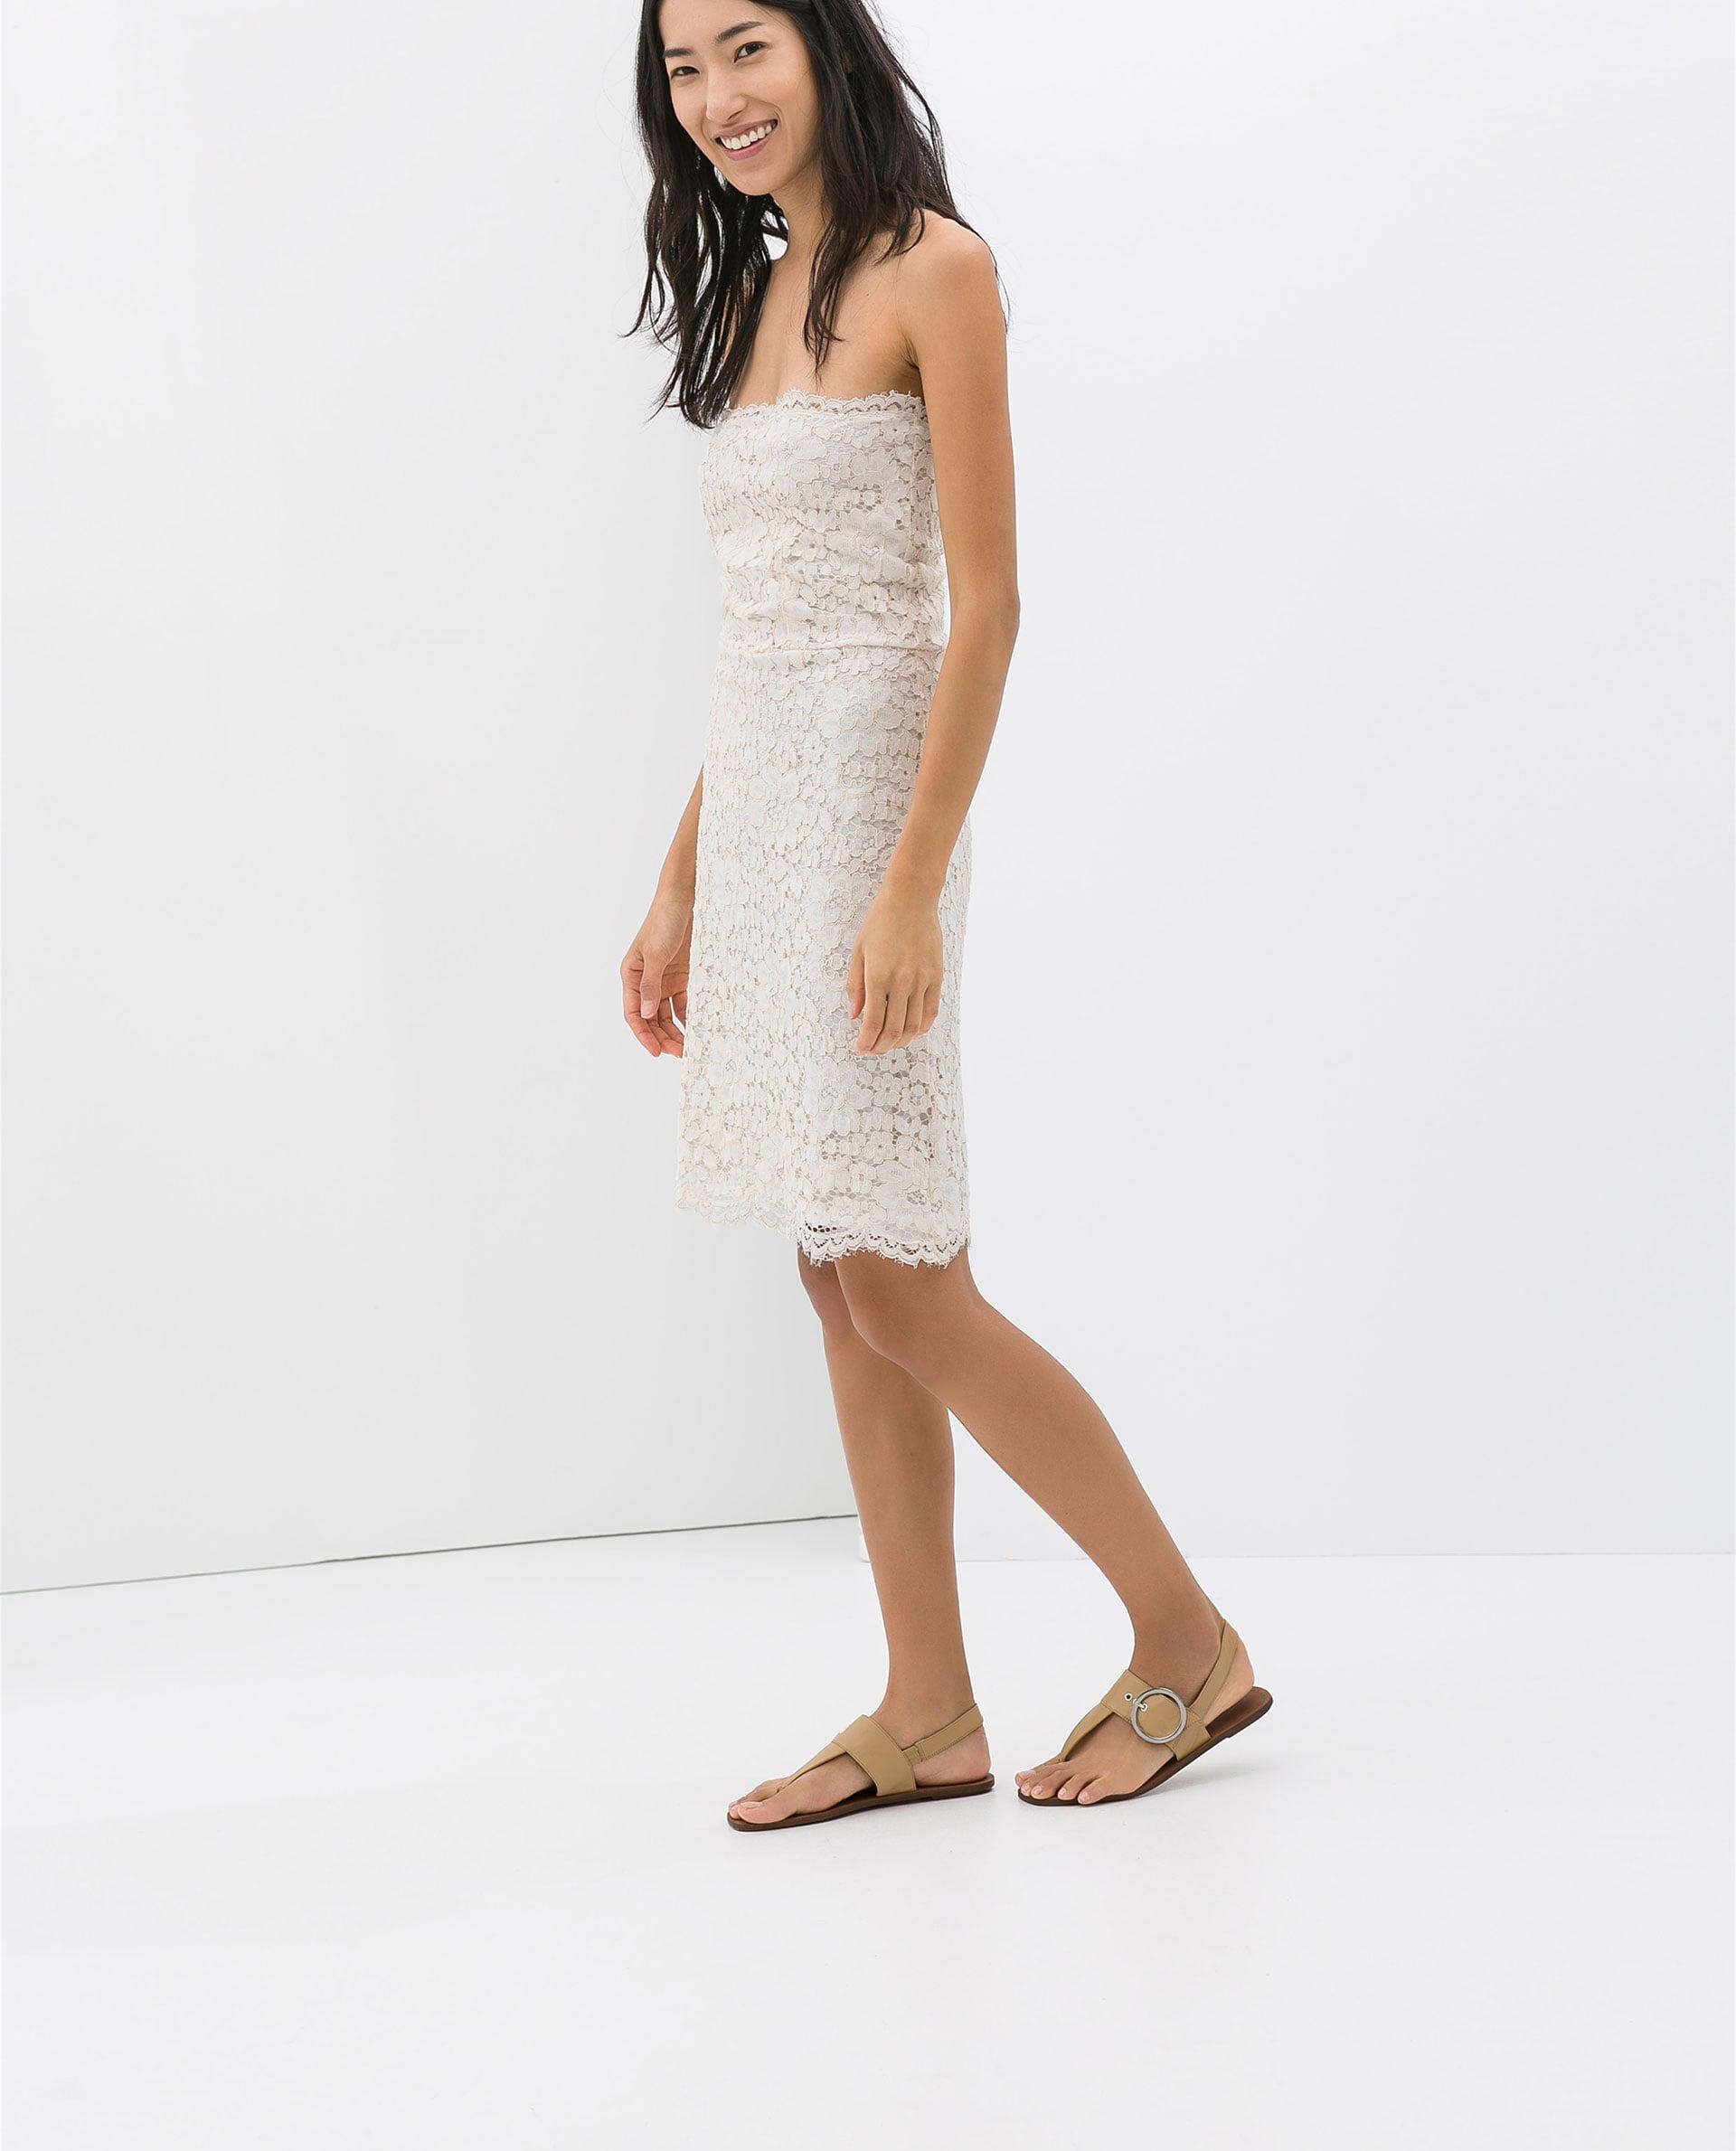 Zara White Lace Strapless Dress